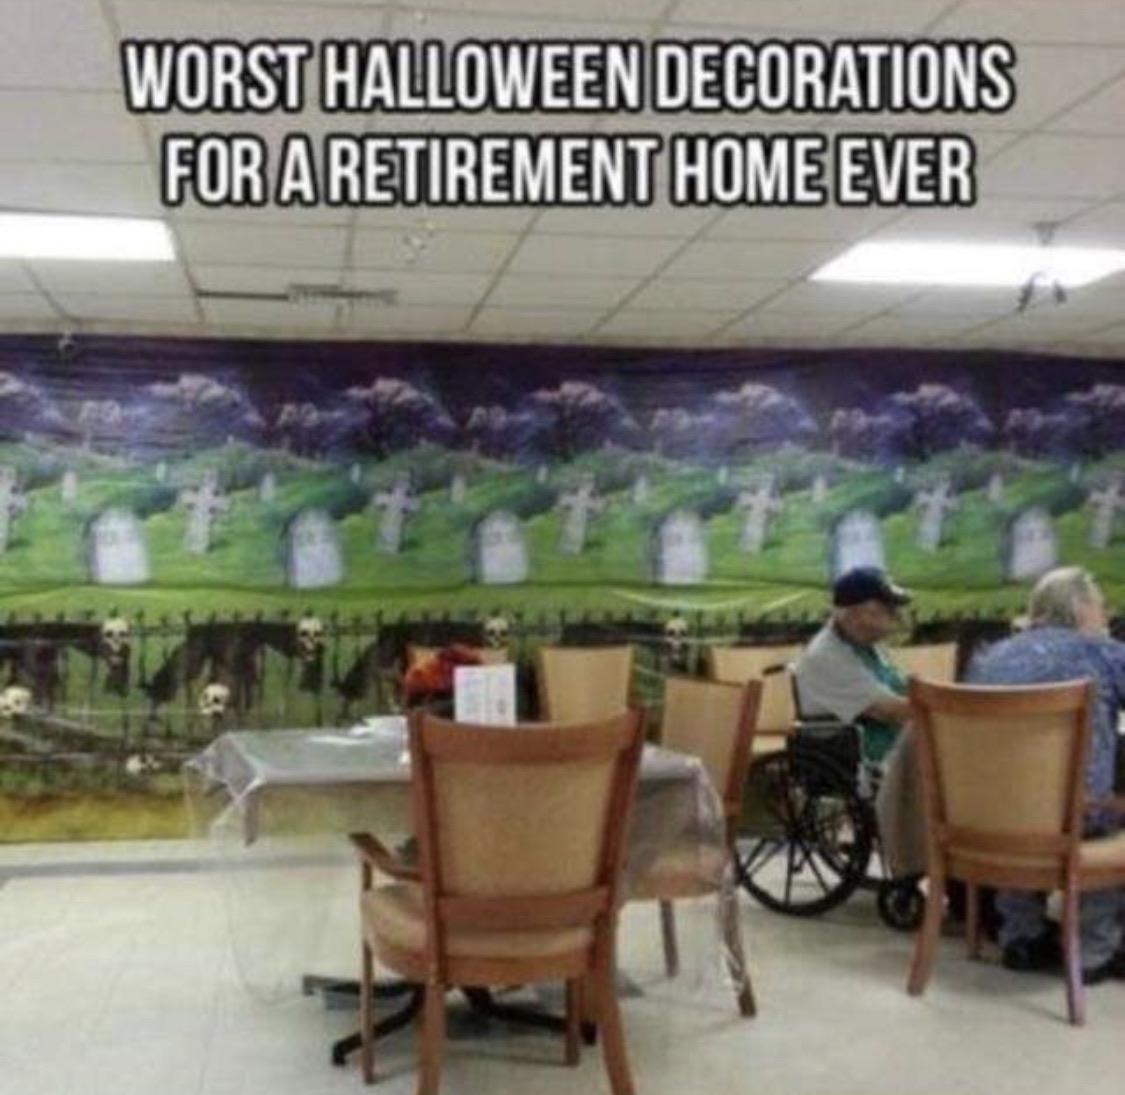 Bit harsh...but soo funny